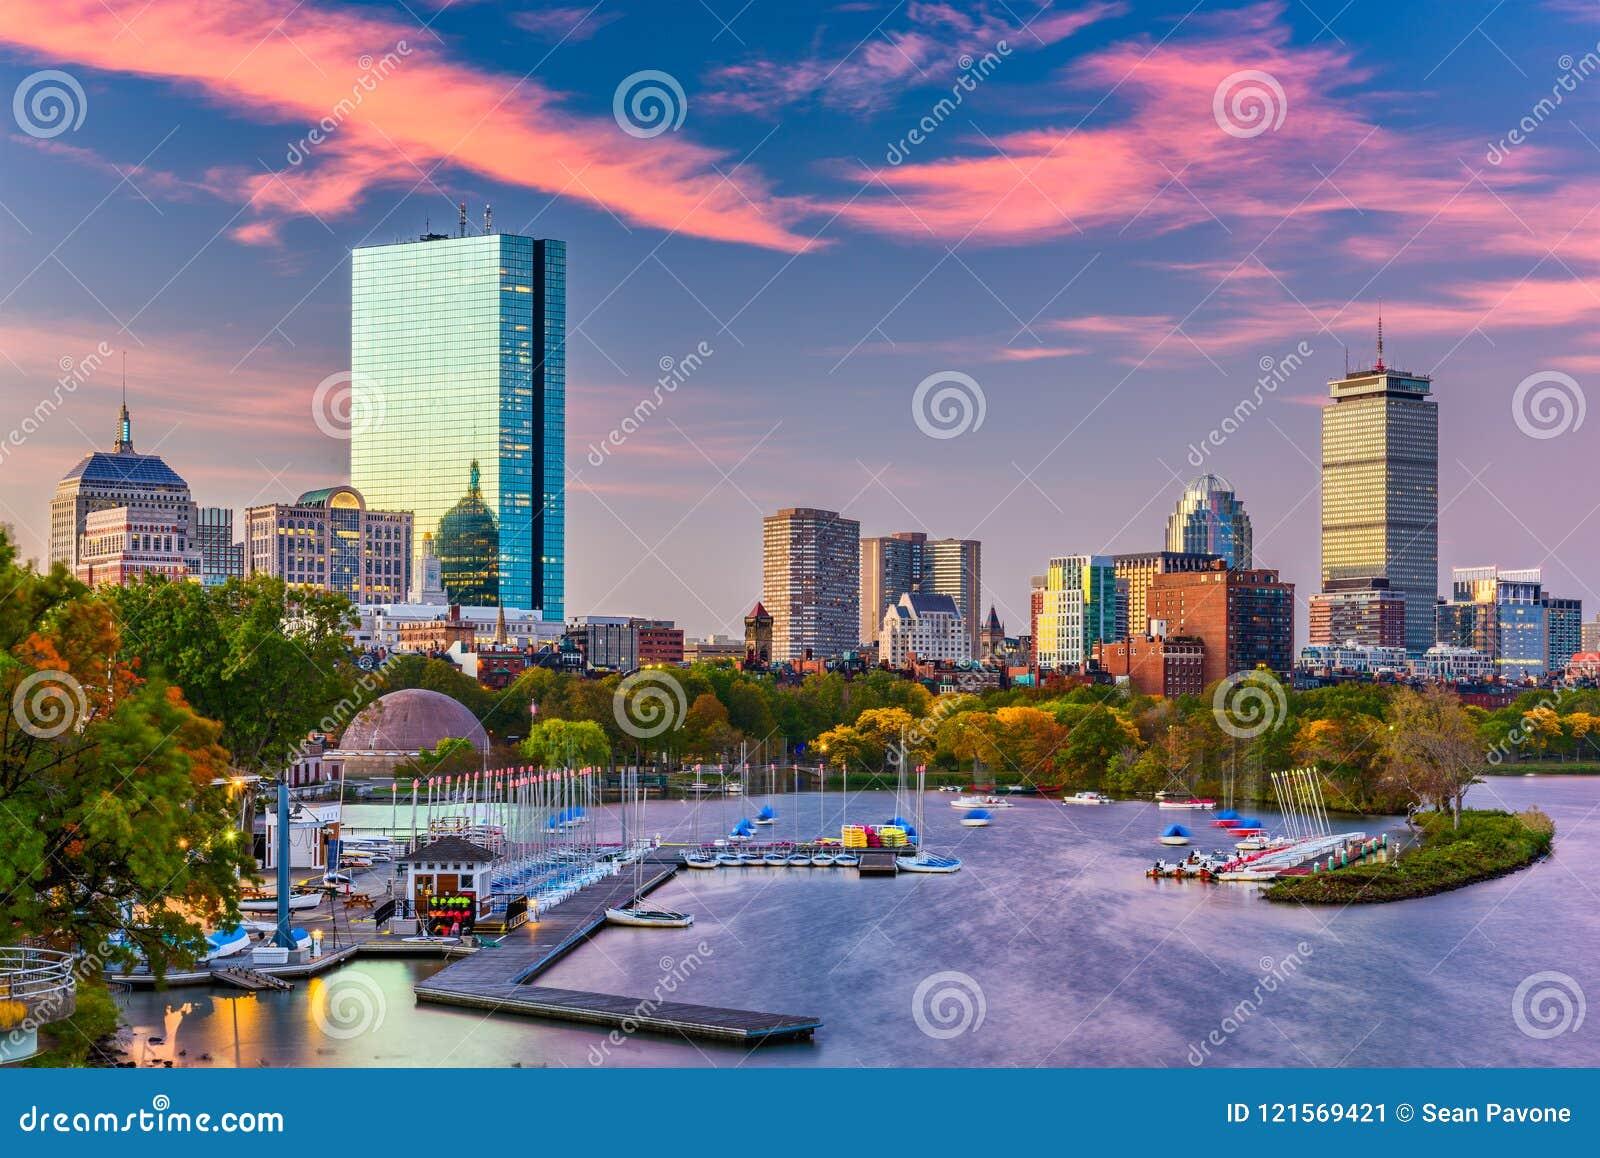 Boston, Massachusetts, USA River Skyline